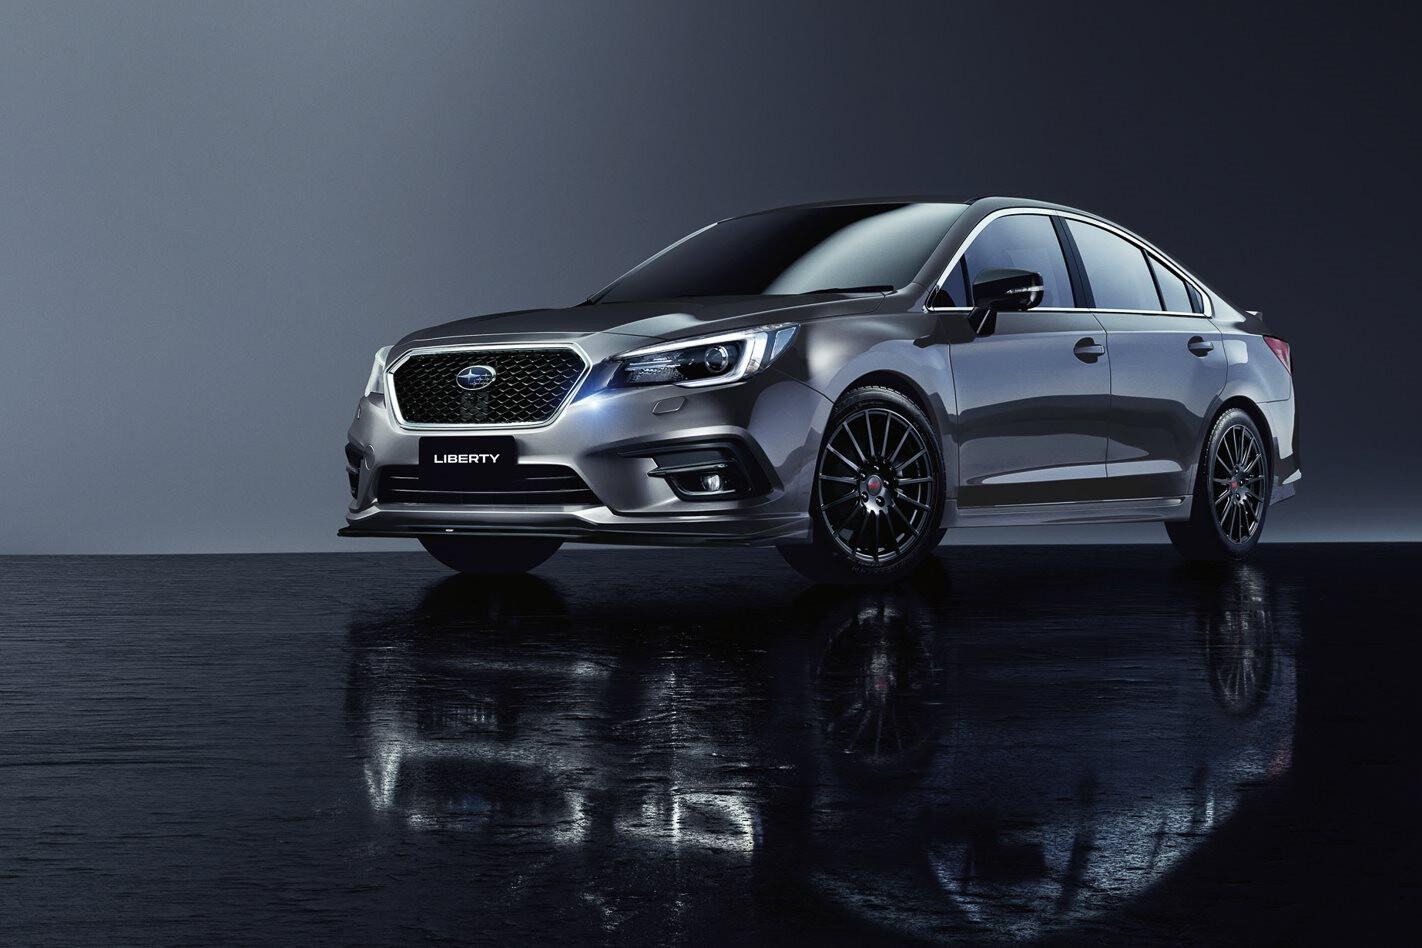 Subaru Liberty Final Edition 2020